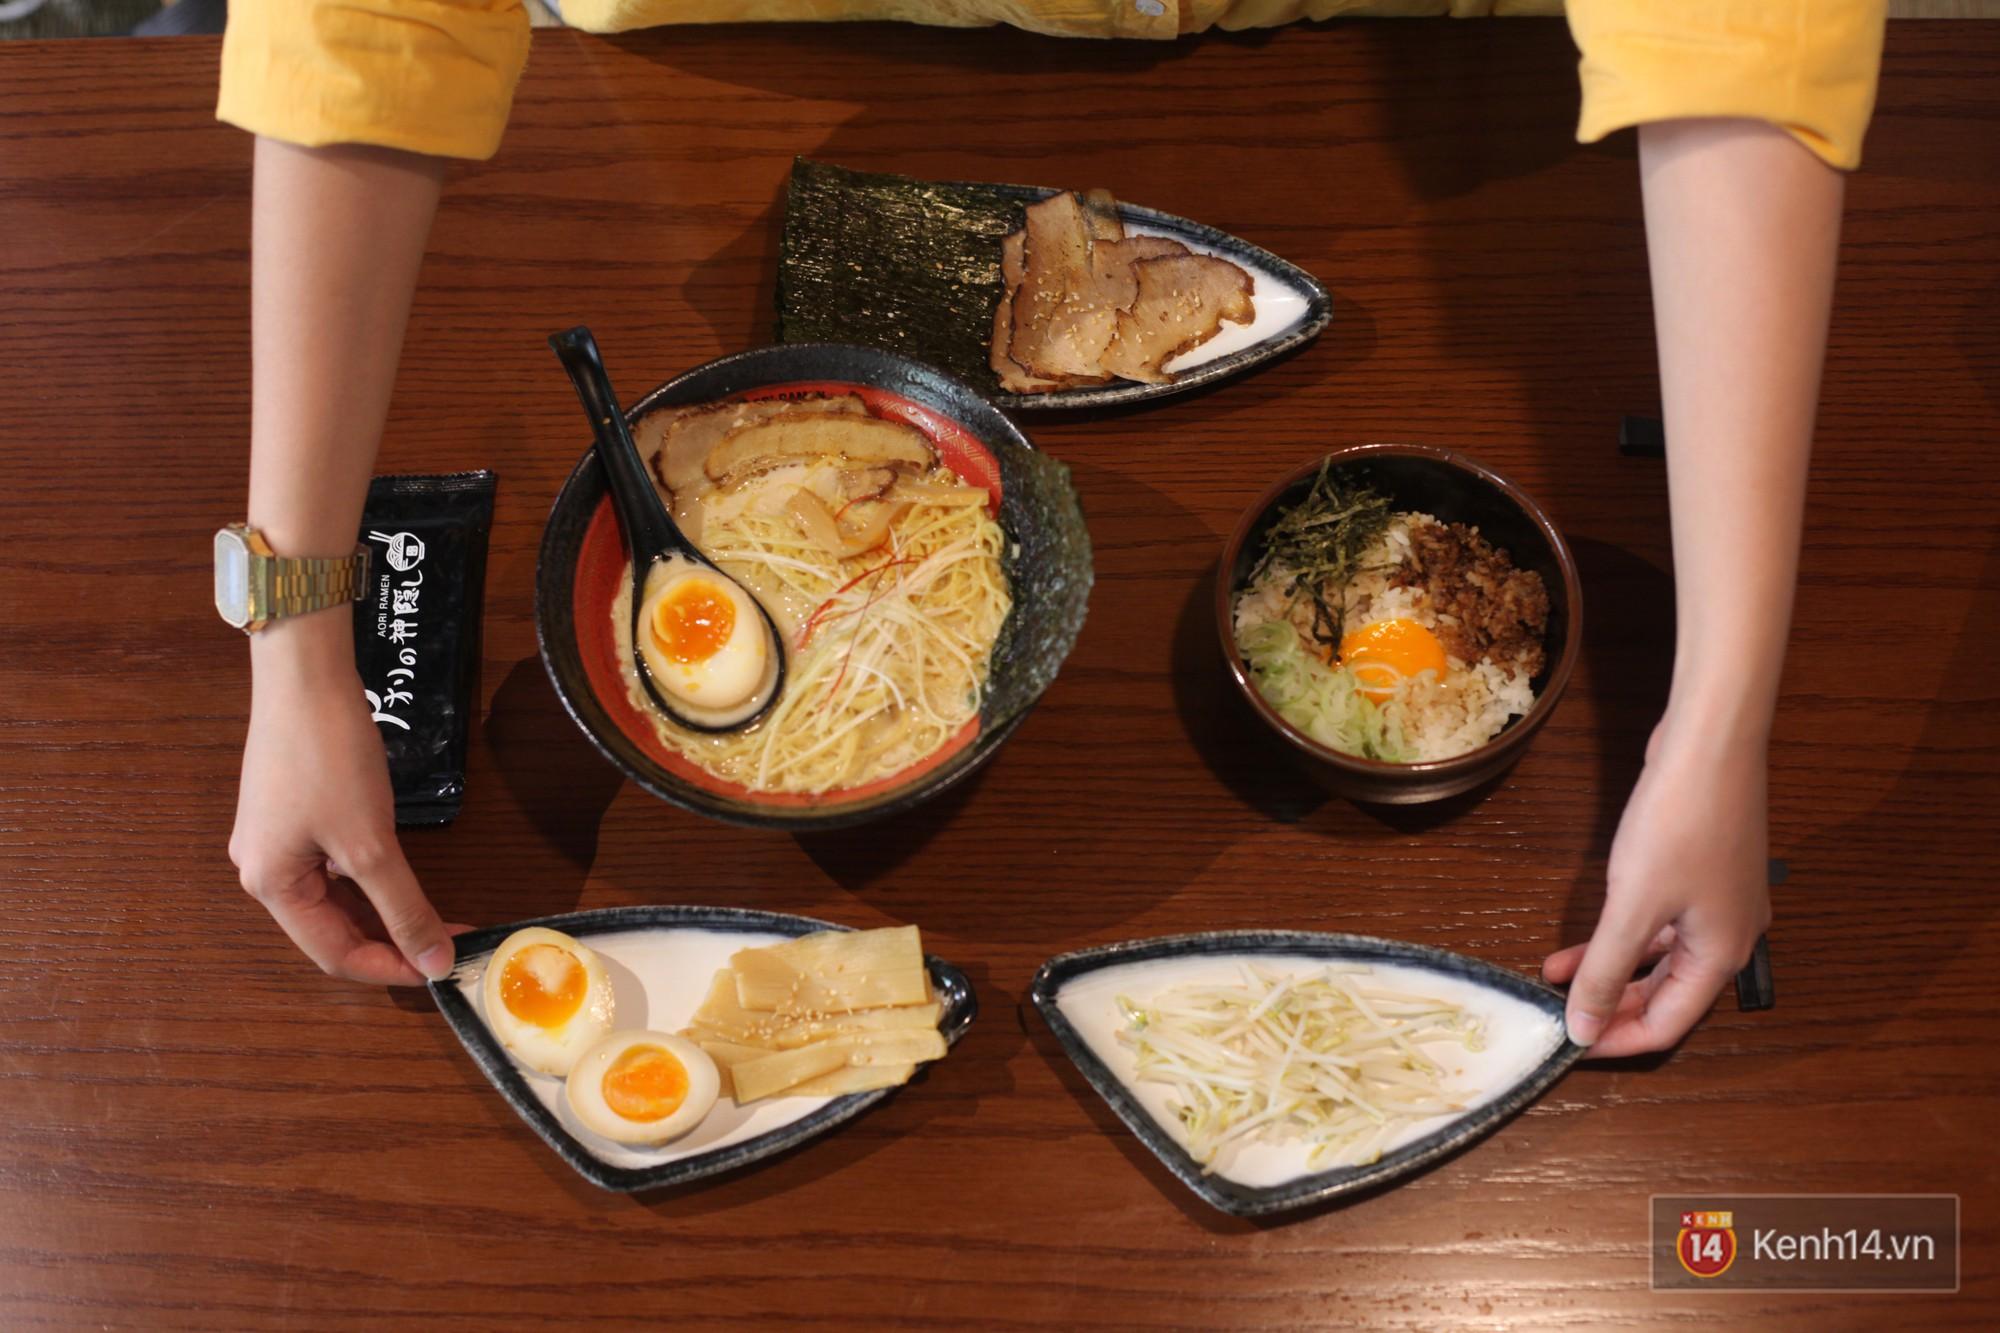 Kinh doanh của Aori Ramen tại Hàn tuột dốc thê thảm sau bê bối của Seungri - Ảnh 3.